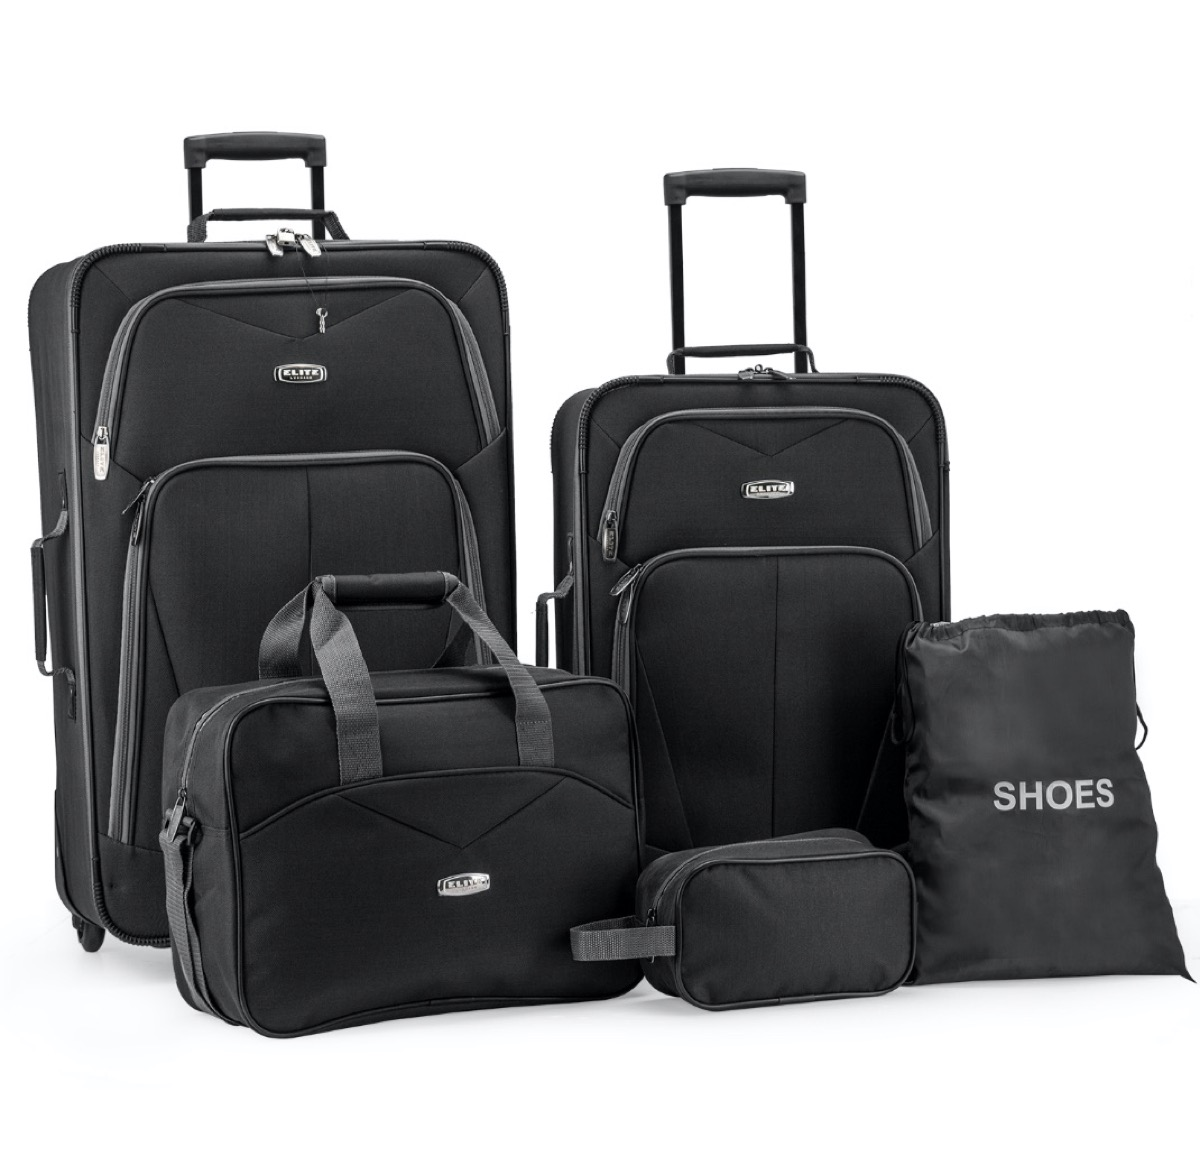 five piece black luggage set